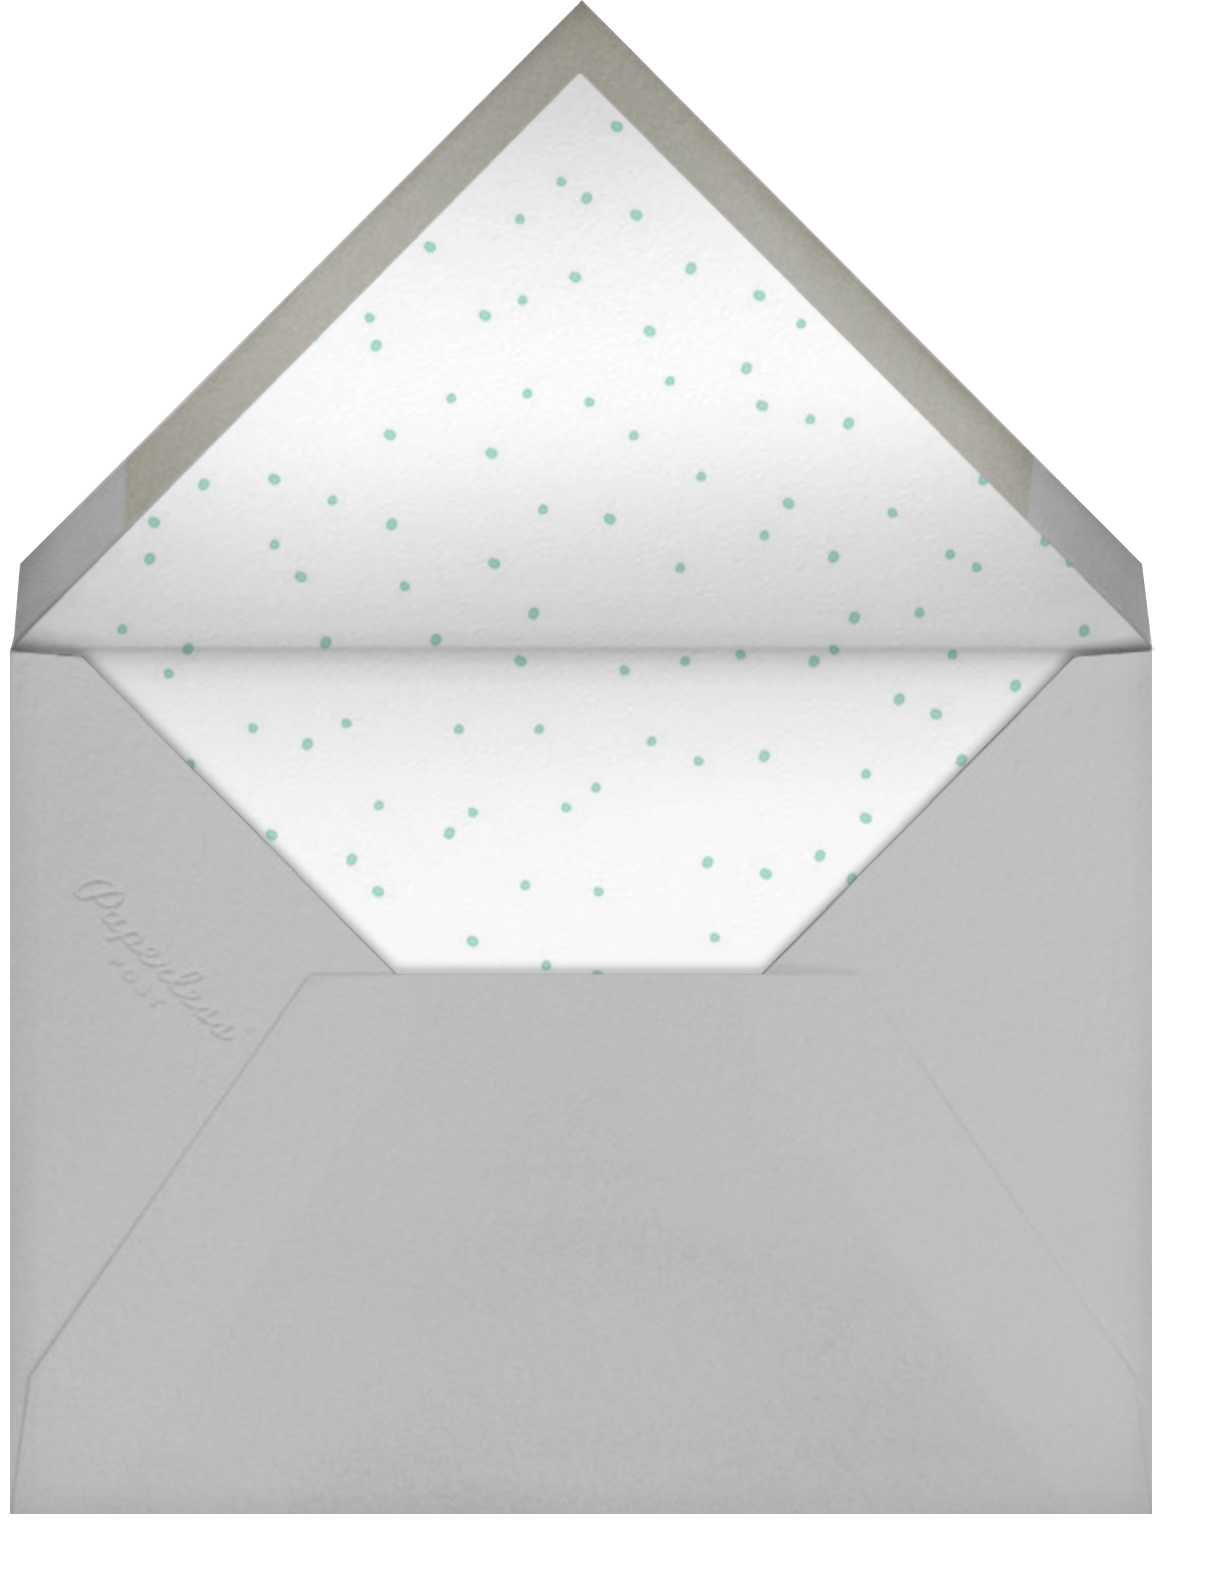 Tweeting Over Teatime Photo - Little Cube - Woodland baby shower - envelope back